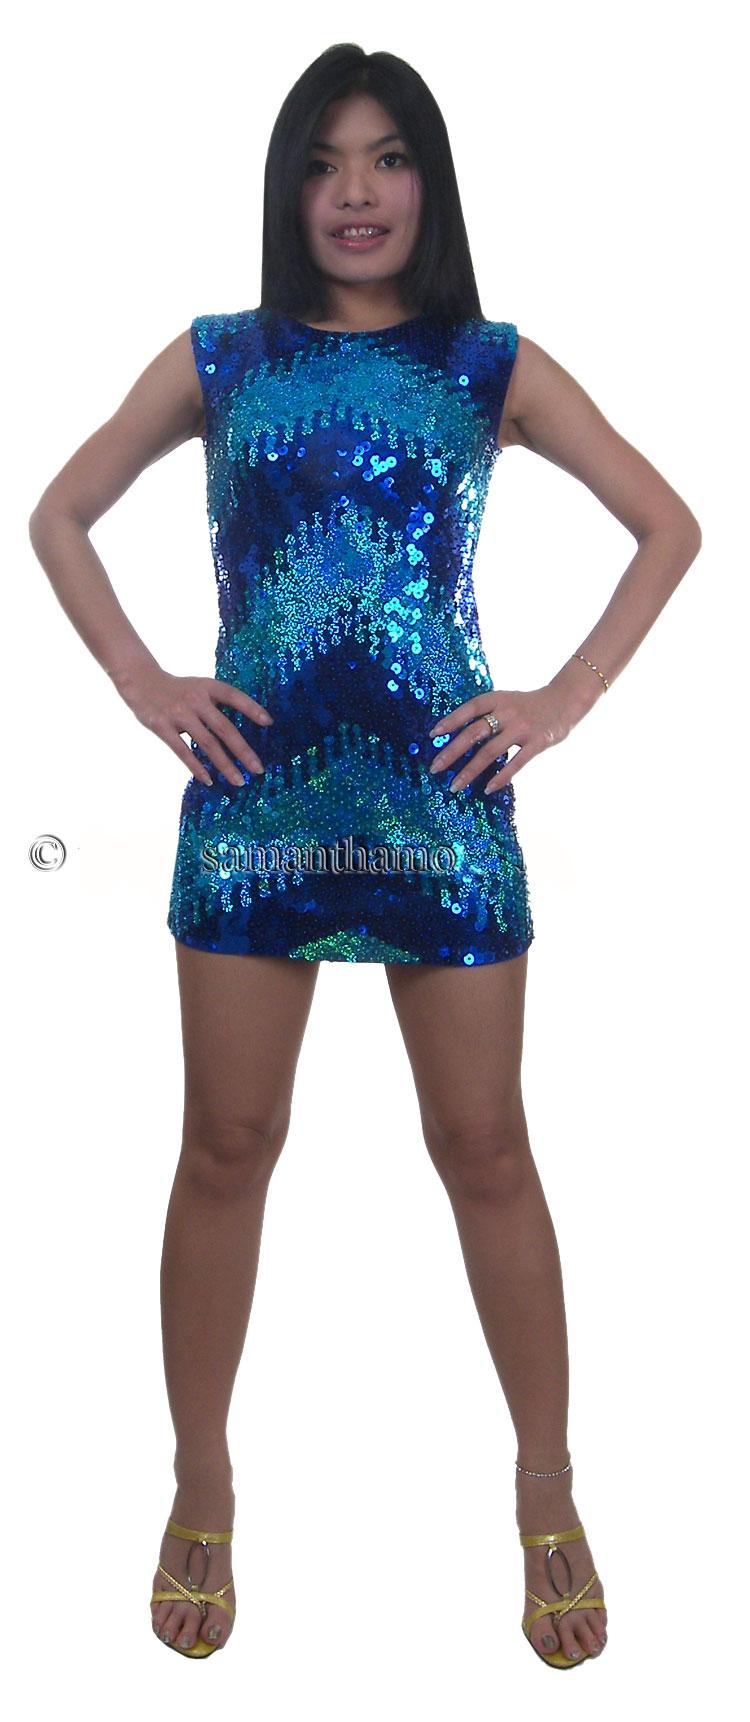 https://michaeljacksoncelebrityclothing.com/Celebrity-Costumes/CBS0901-sarah-jessica-parker-mini-dresses.jpg